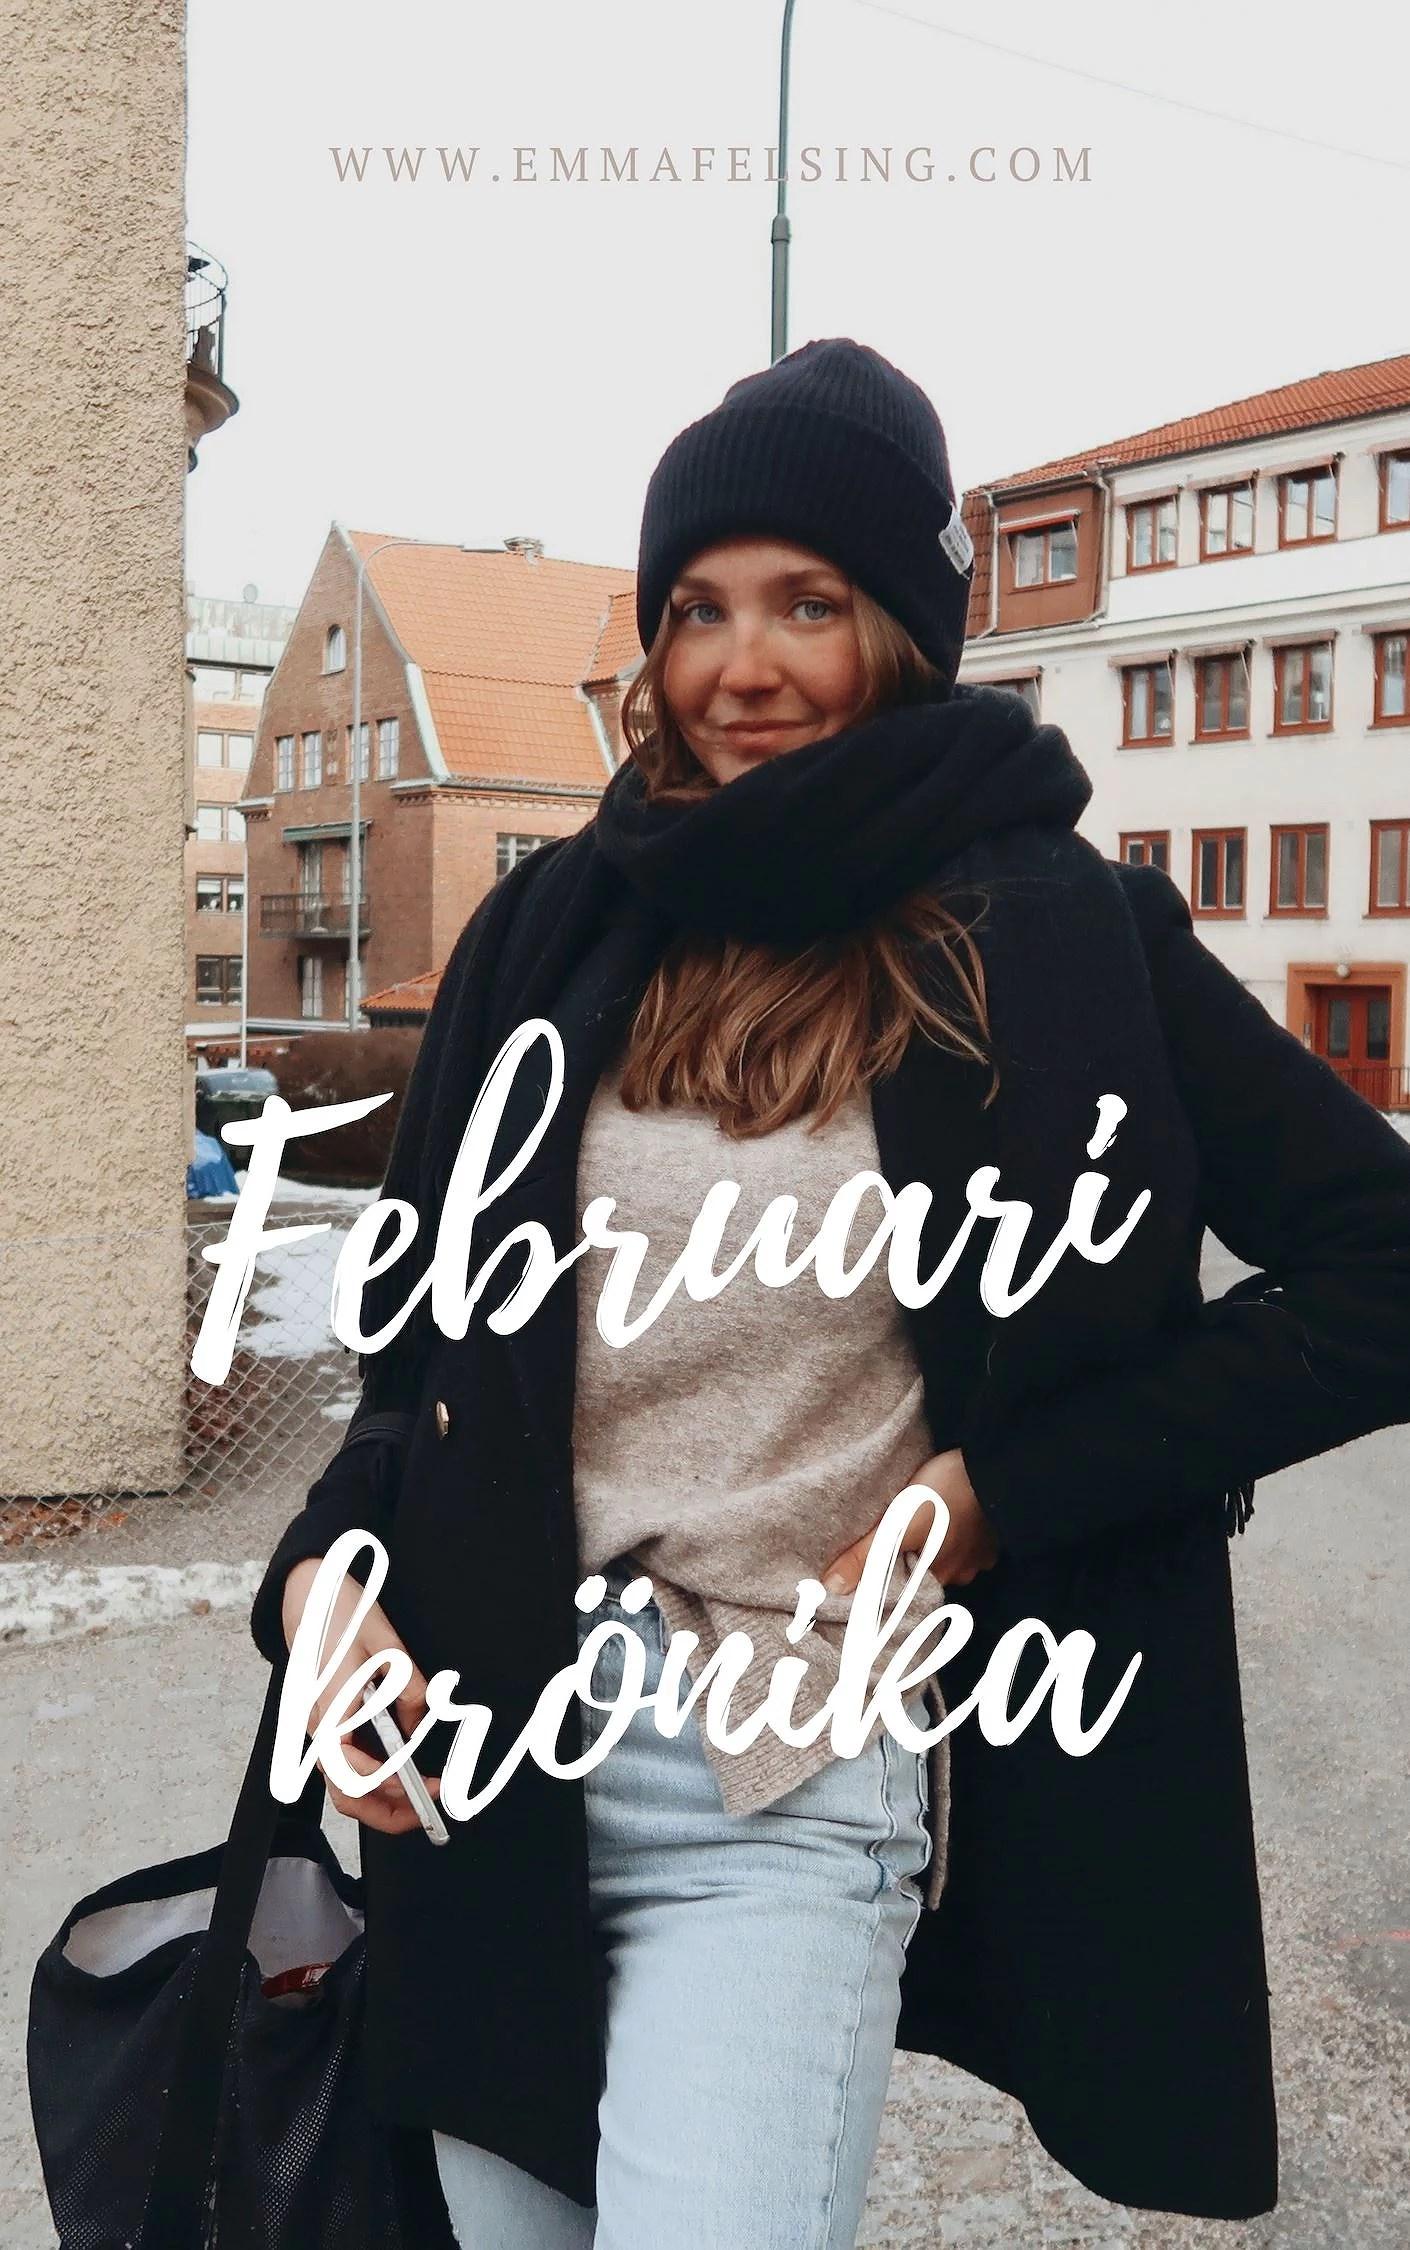 Februari krönika